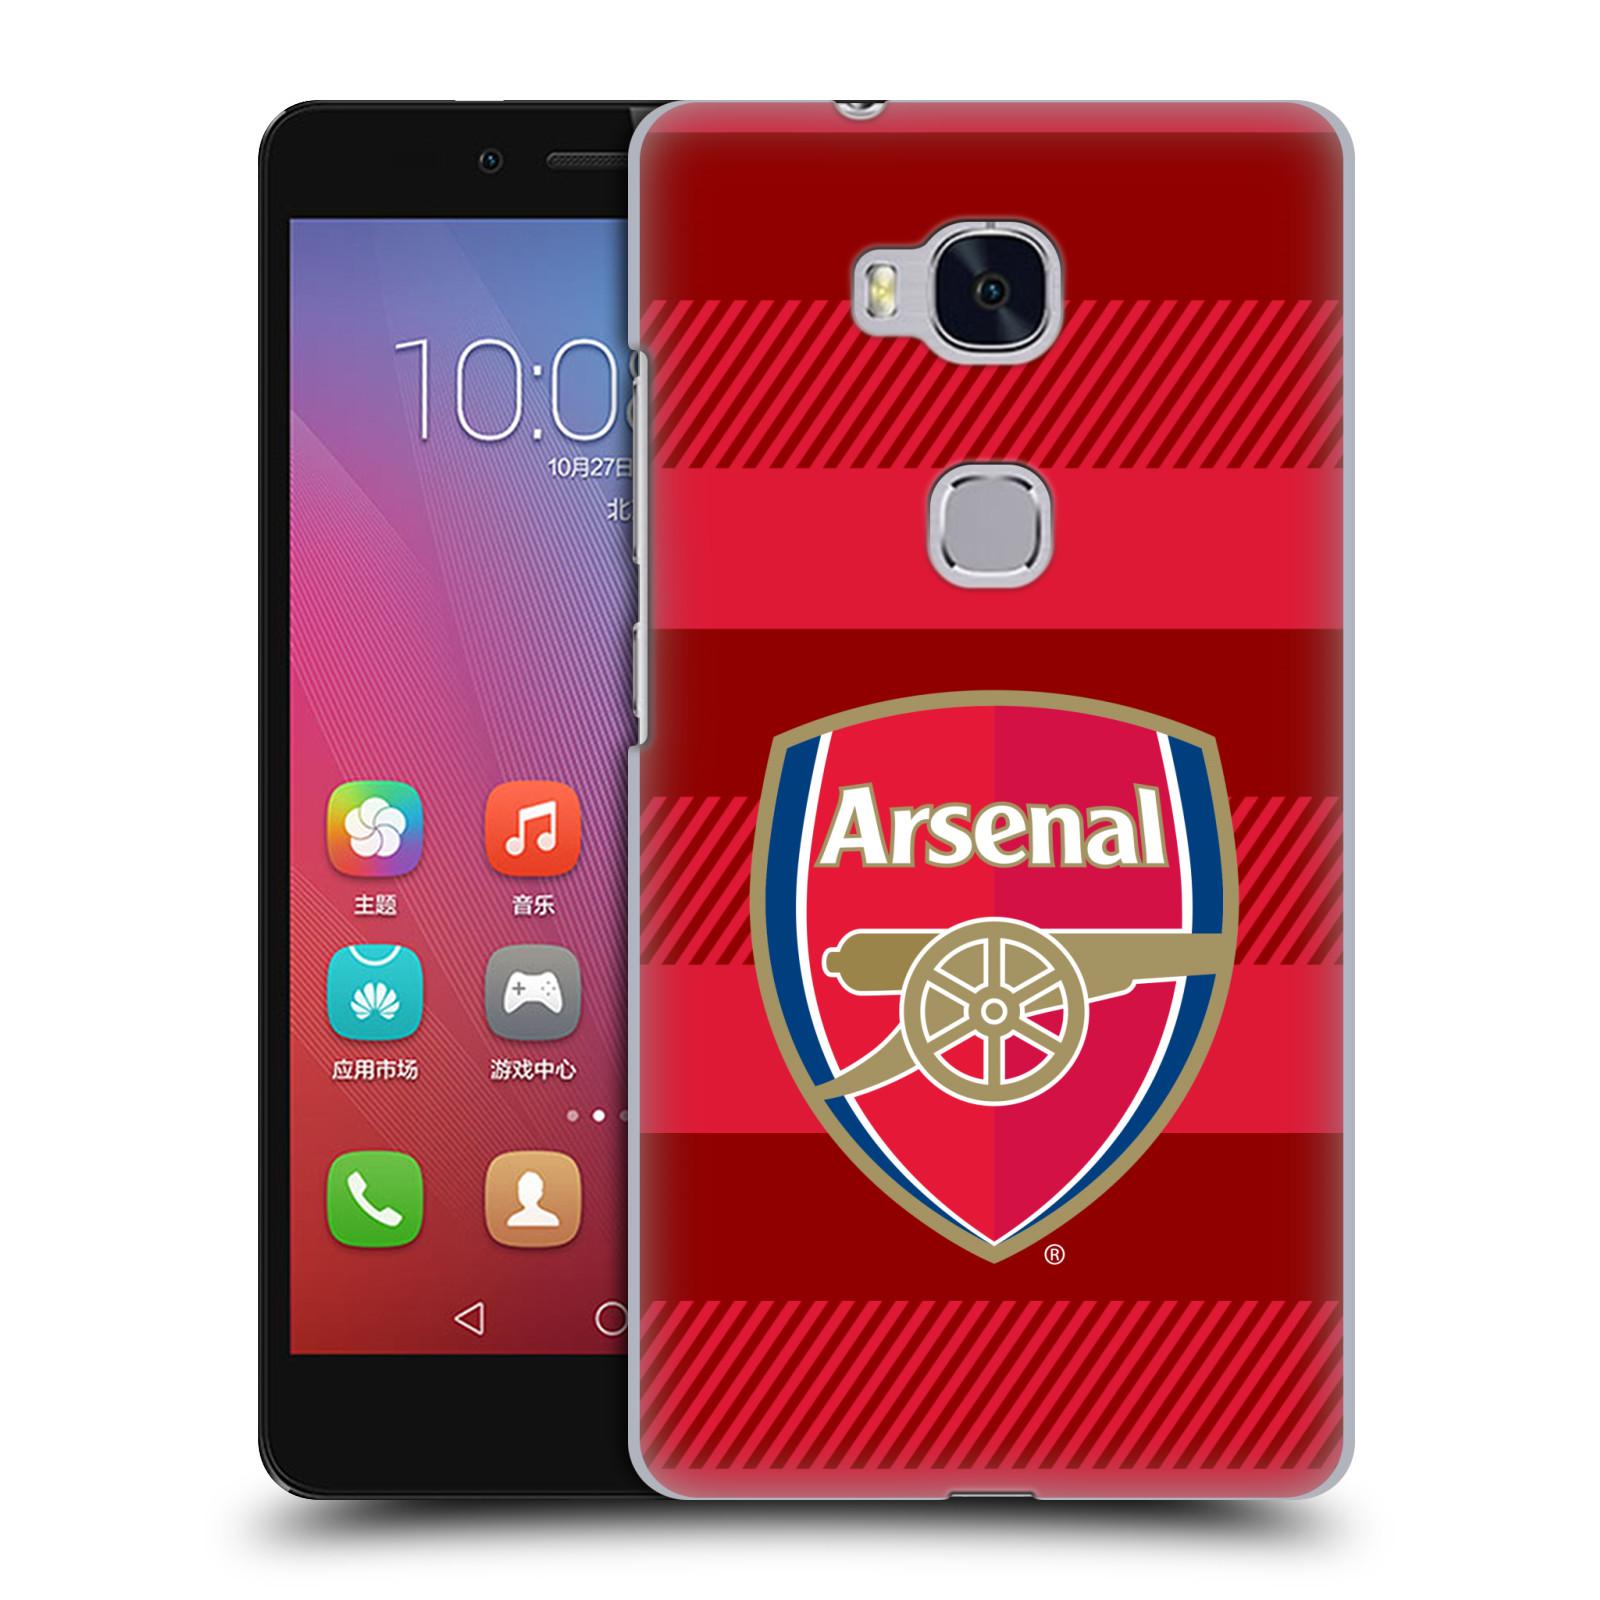 Plastové pouzdro na mobil Honor 5X - Head Case - Arsenal FC - Logo s pruhy